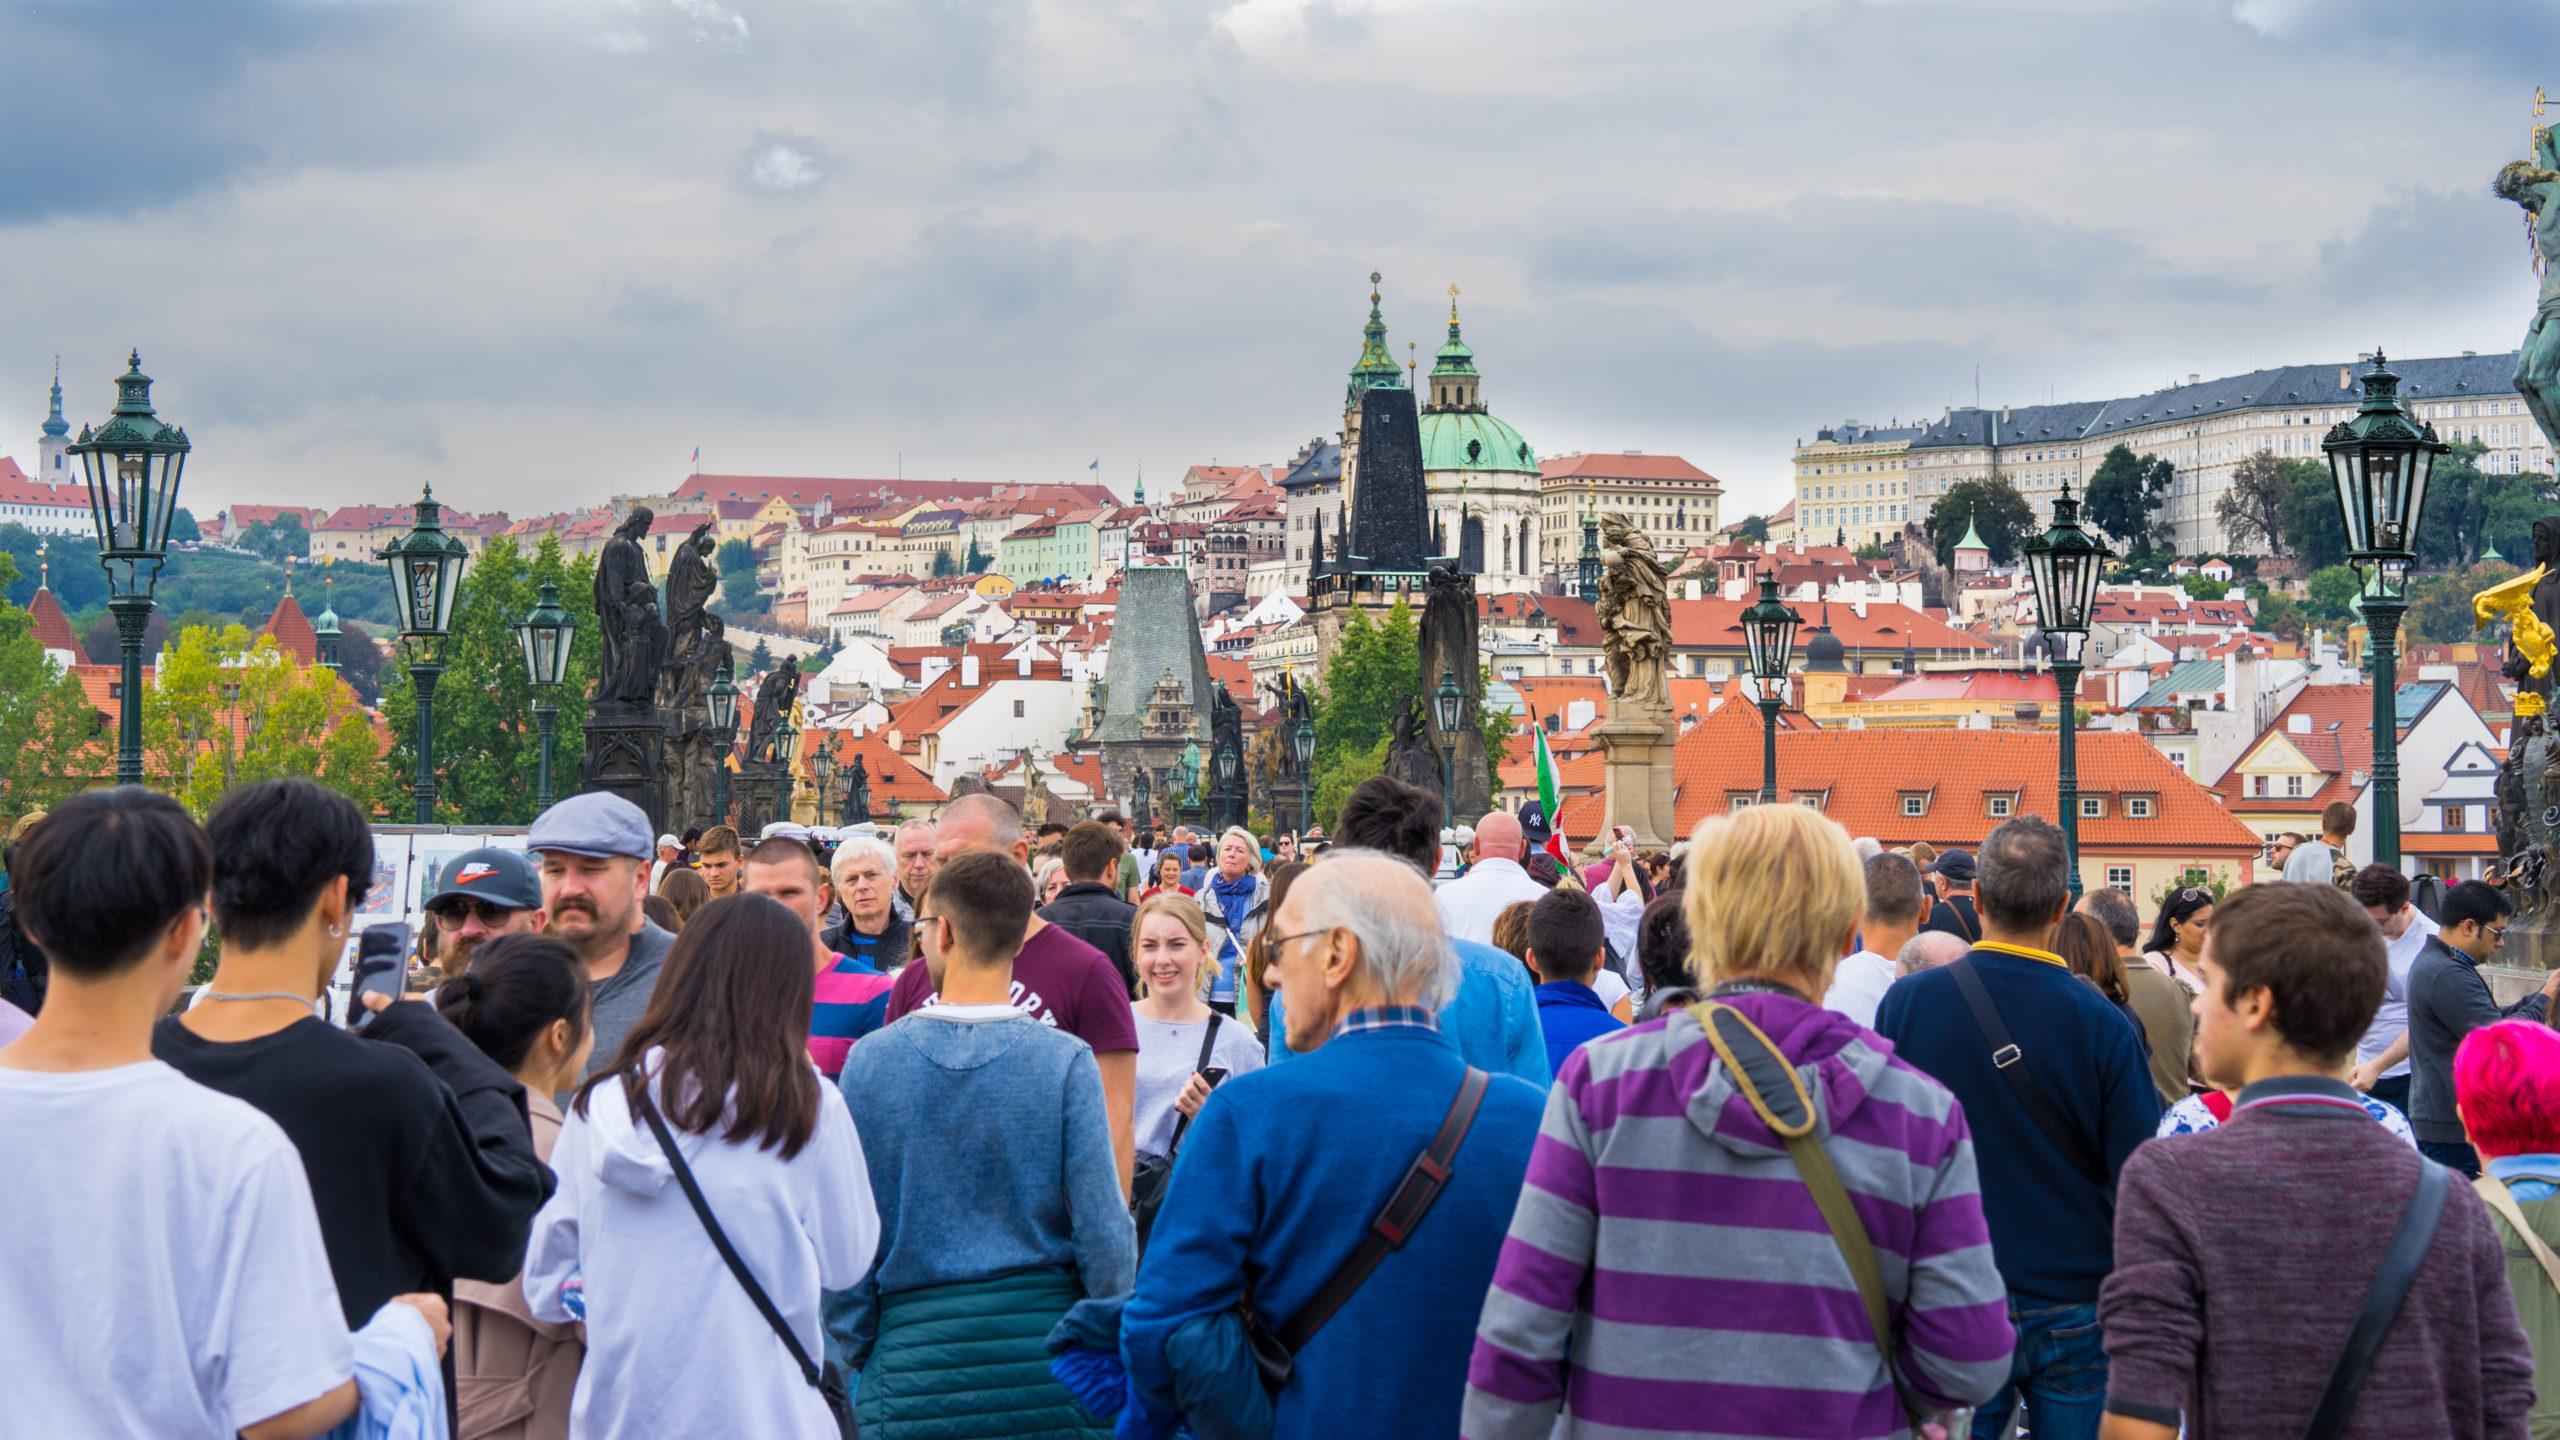 Prag, an der Moldau, auf der Karlsbrücke